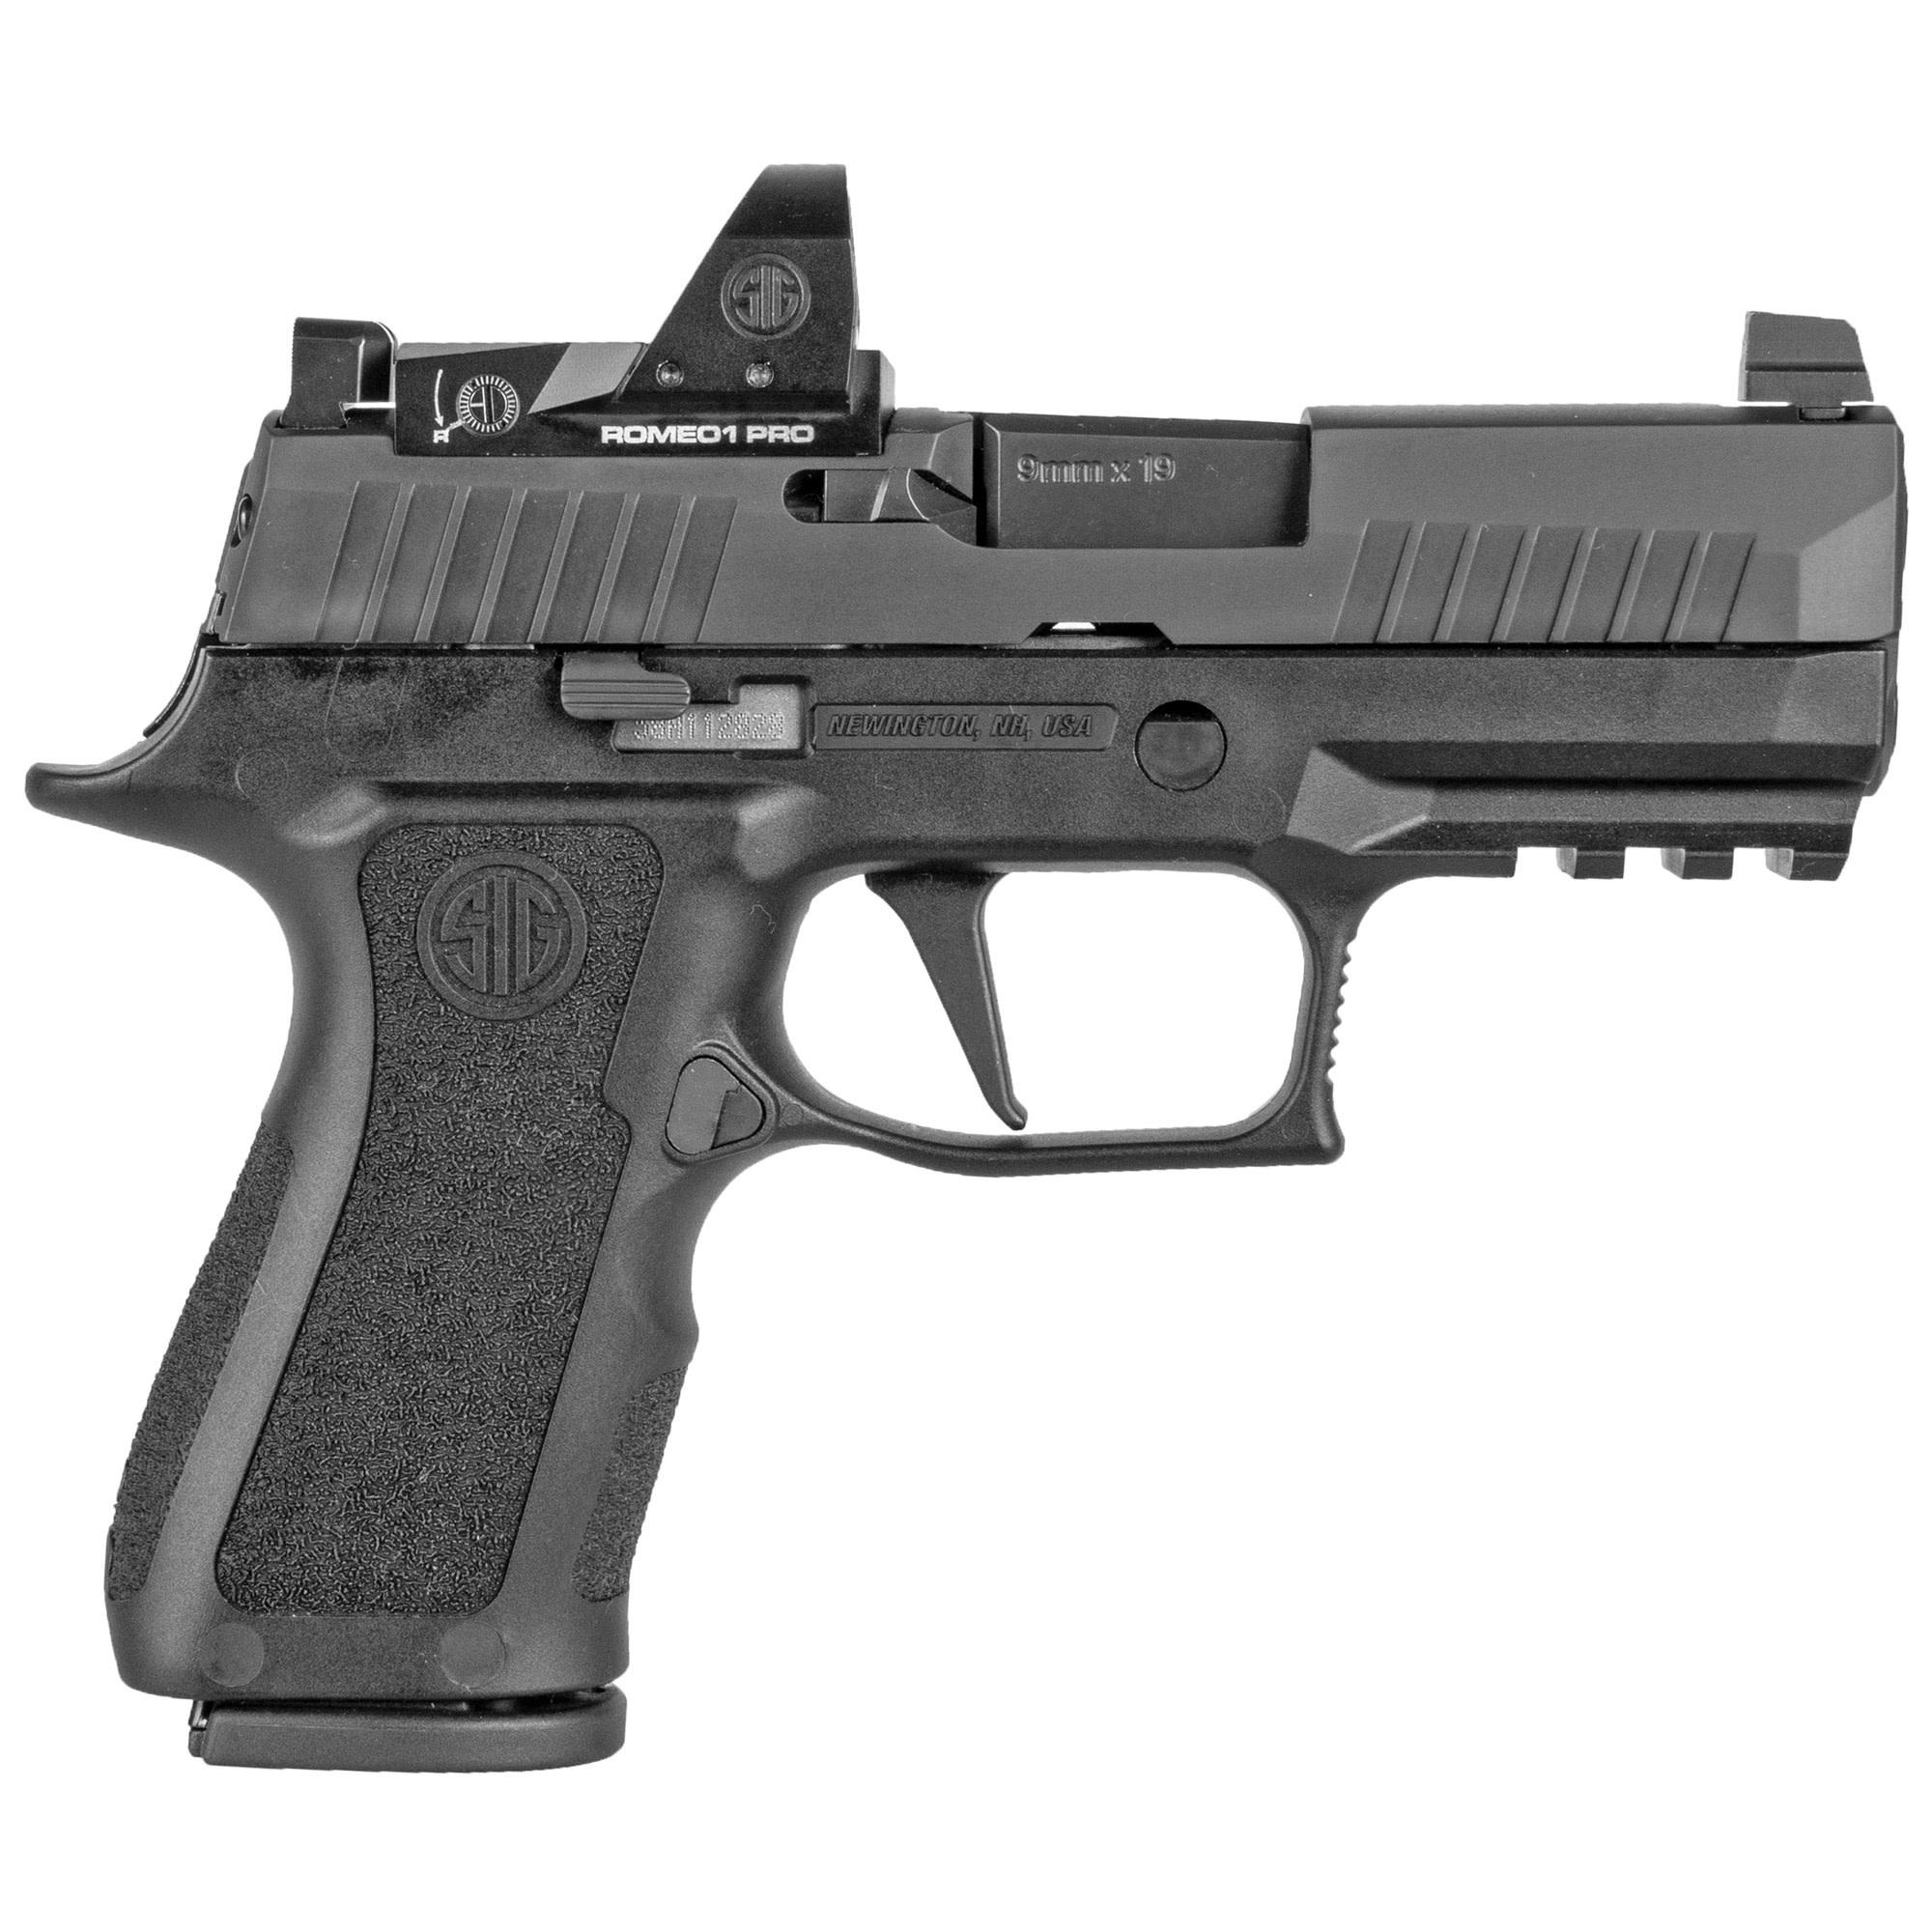 "Sig Sauer P320 X Compact RXP, 9mm, 3.6"", Black, Night Sights, Romeo1 Pro, 15Rd, 2 Magazines"